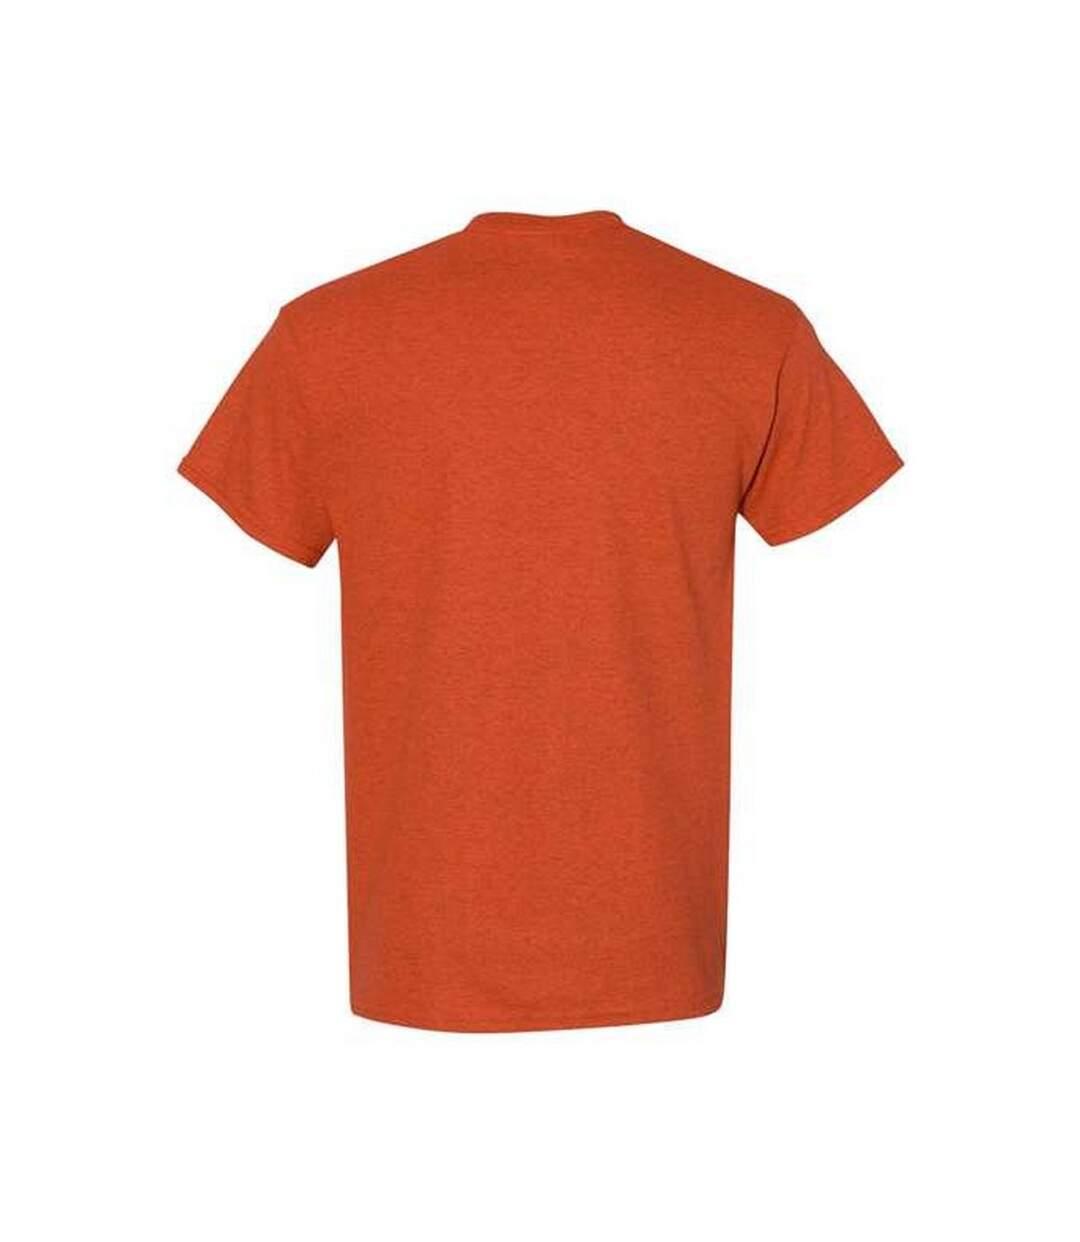 Gildan Mens Heavy Cotton Short Sleeve T-Shirt (Heather Sapphire) - UTBC481